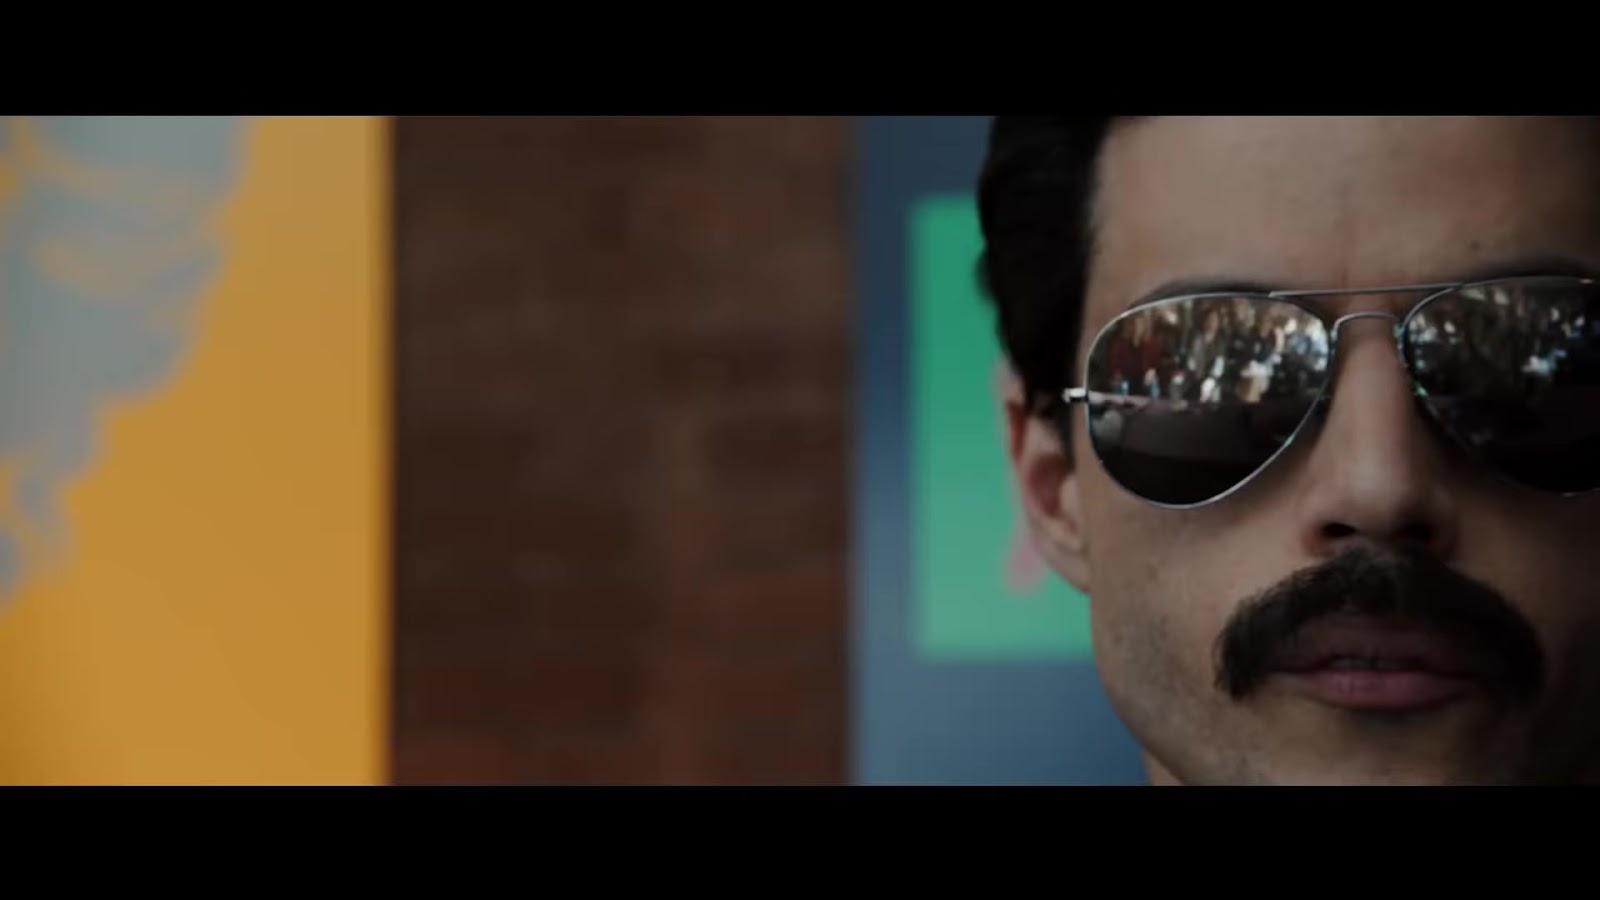 0f5615b11102 Rami Malek as Freddie Mercury in Bohemian Rhapsody wearing Aviator  Sunglasses